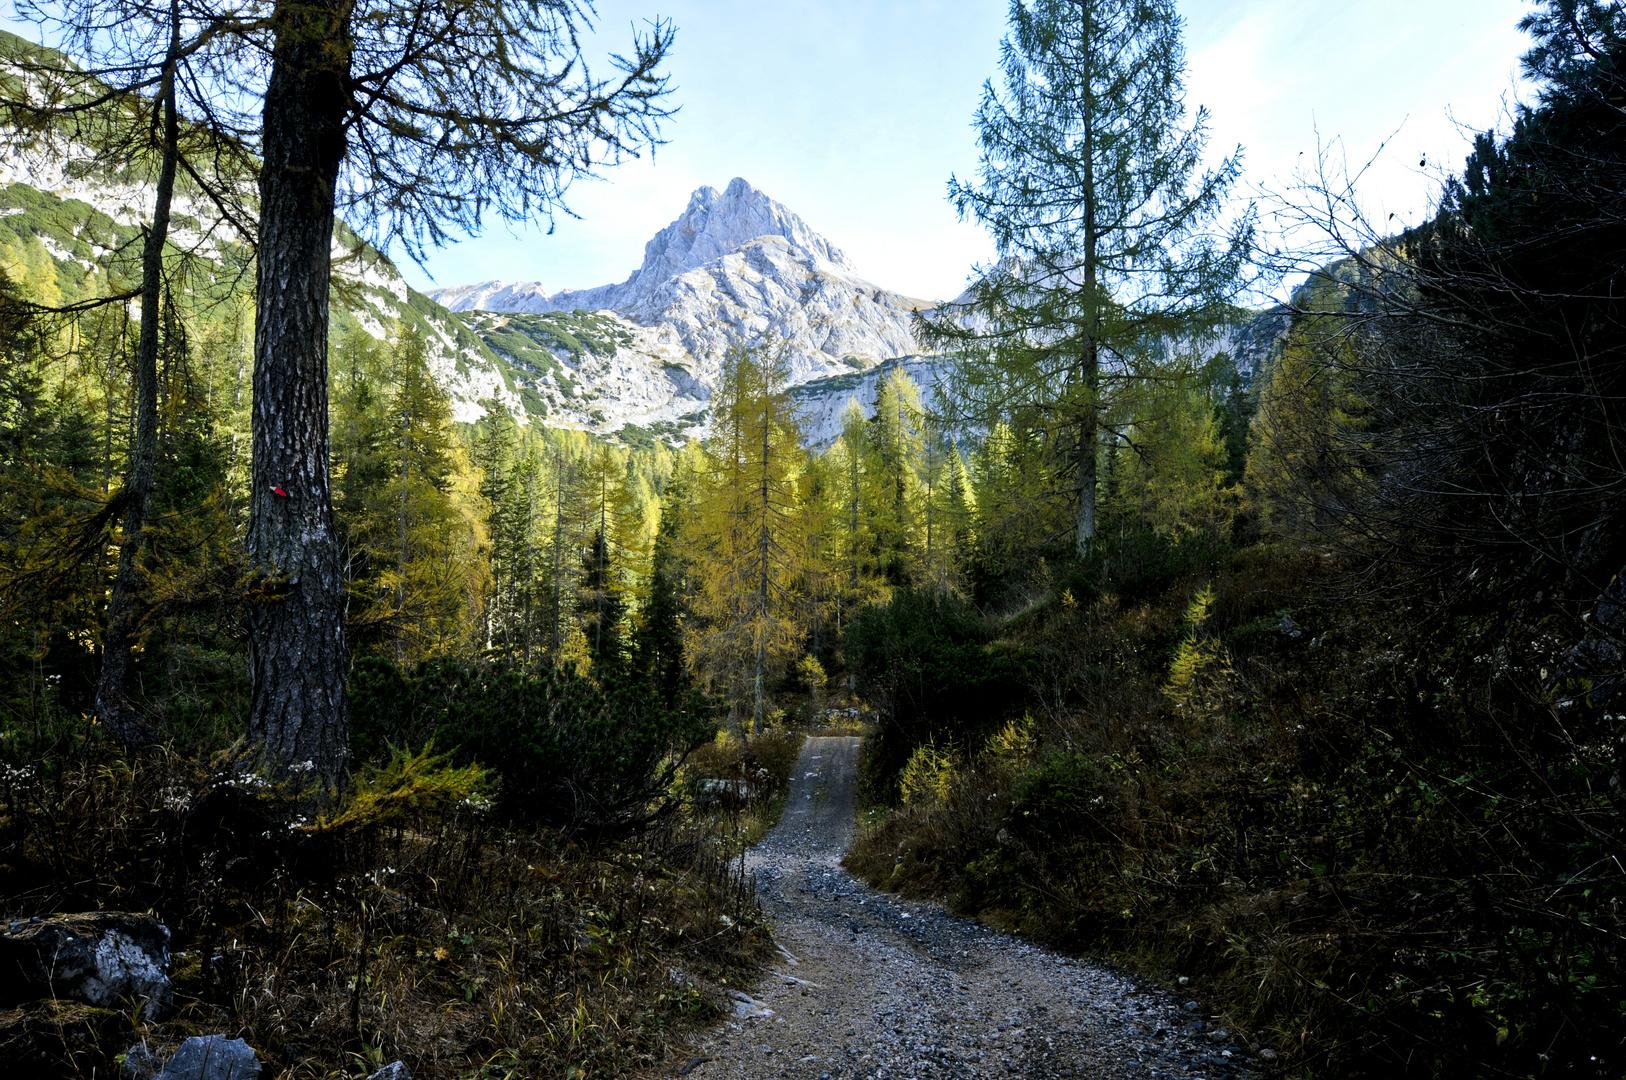 Der Weg zum Ingolstätter Haus